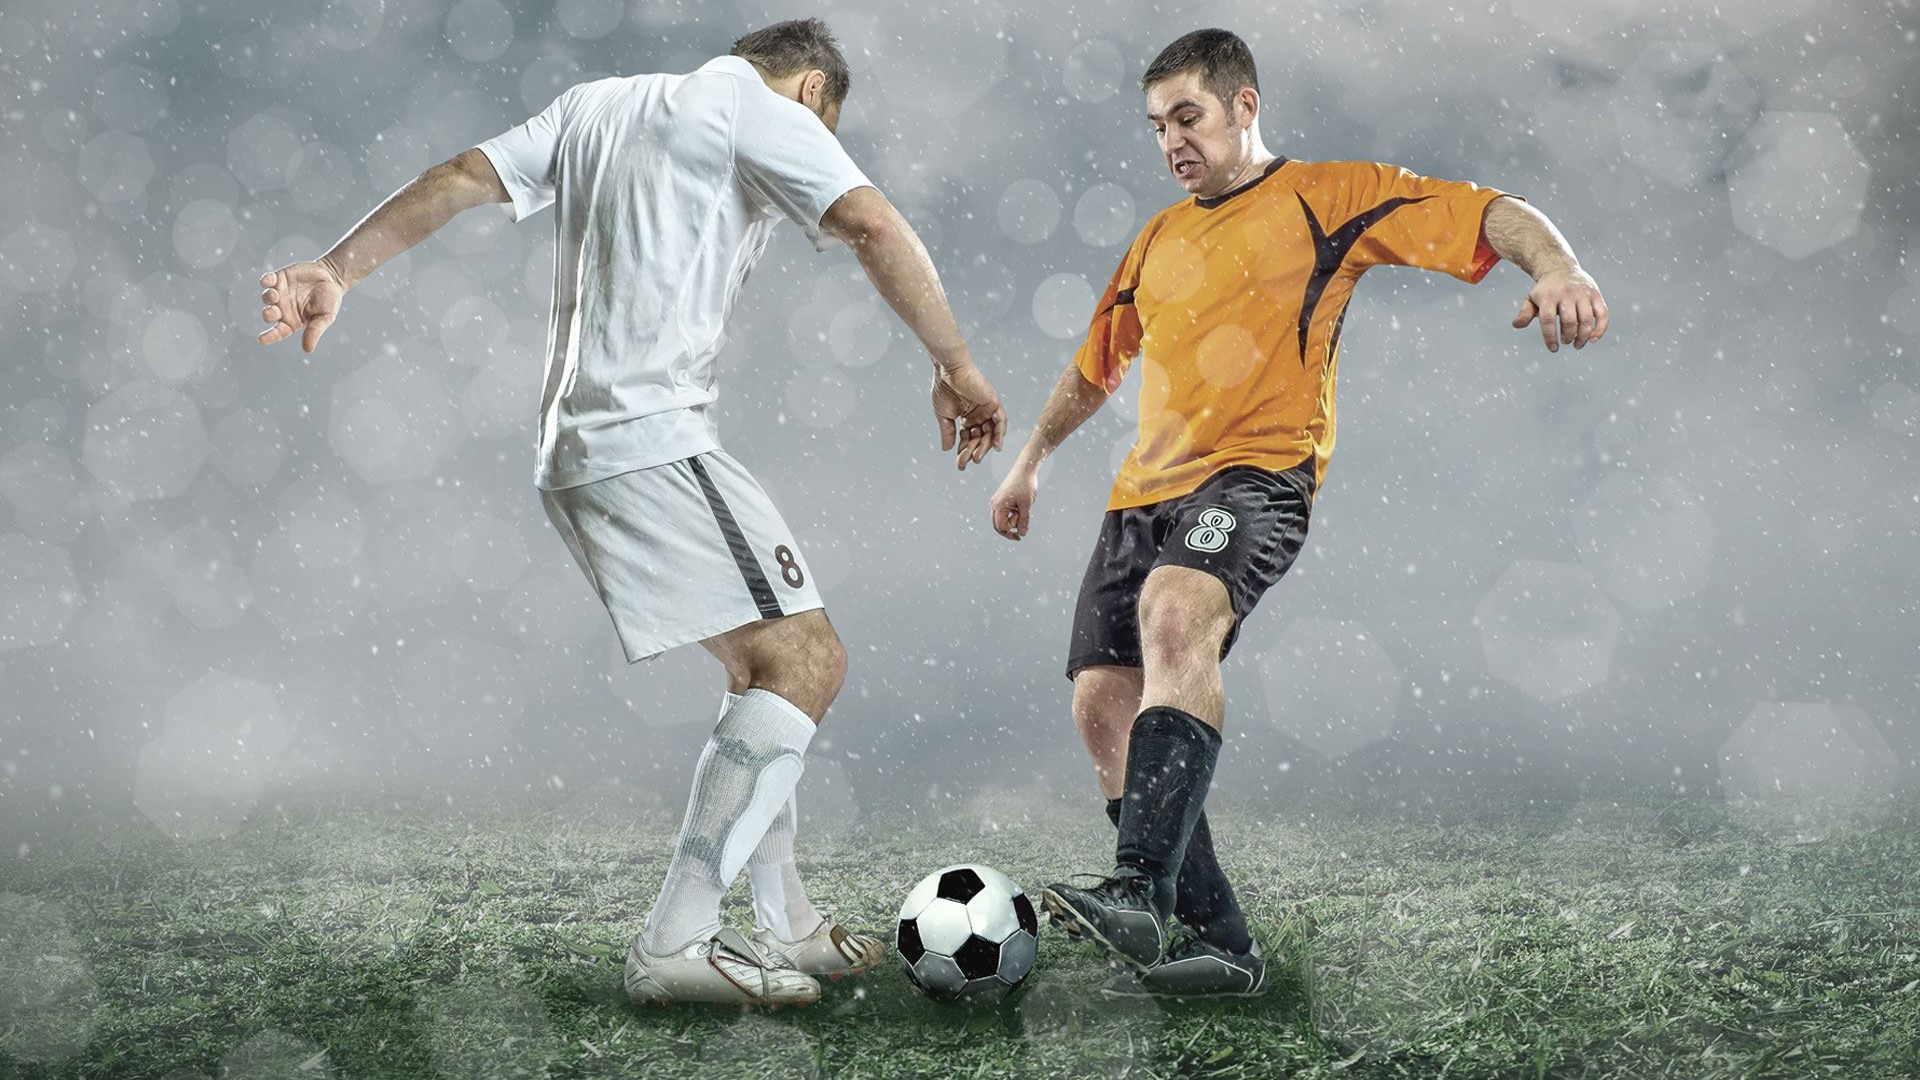 samoa-vs-tonga-rugby-live